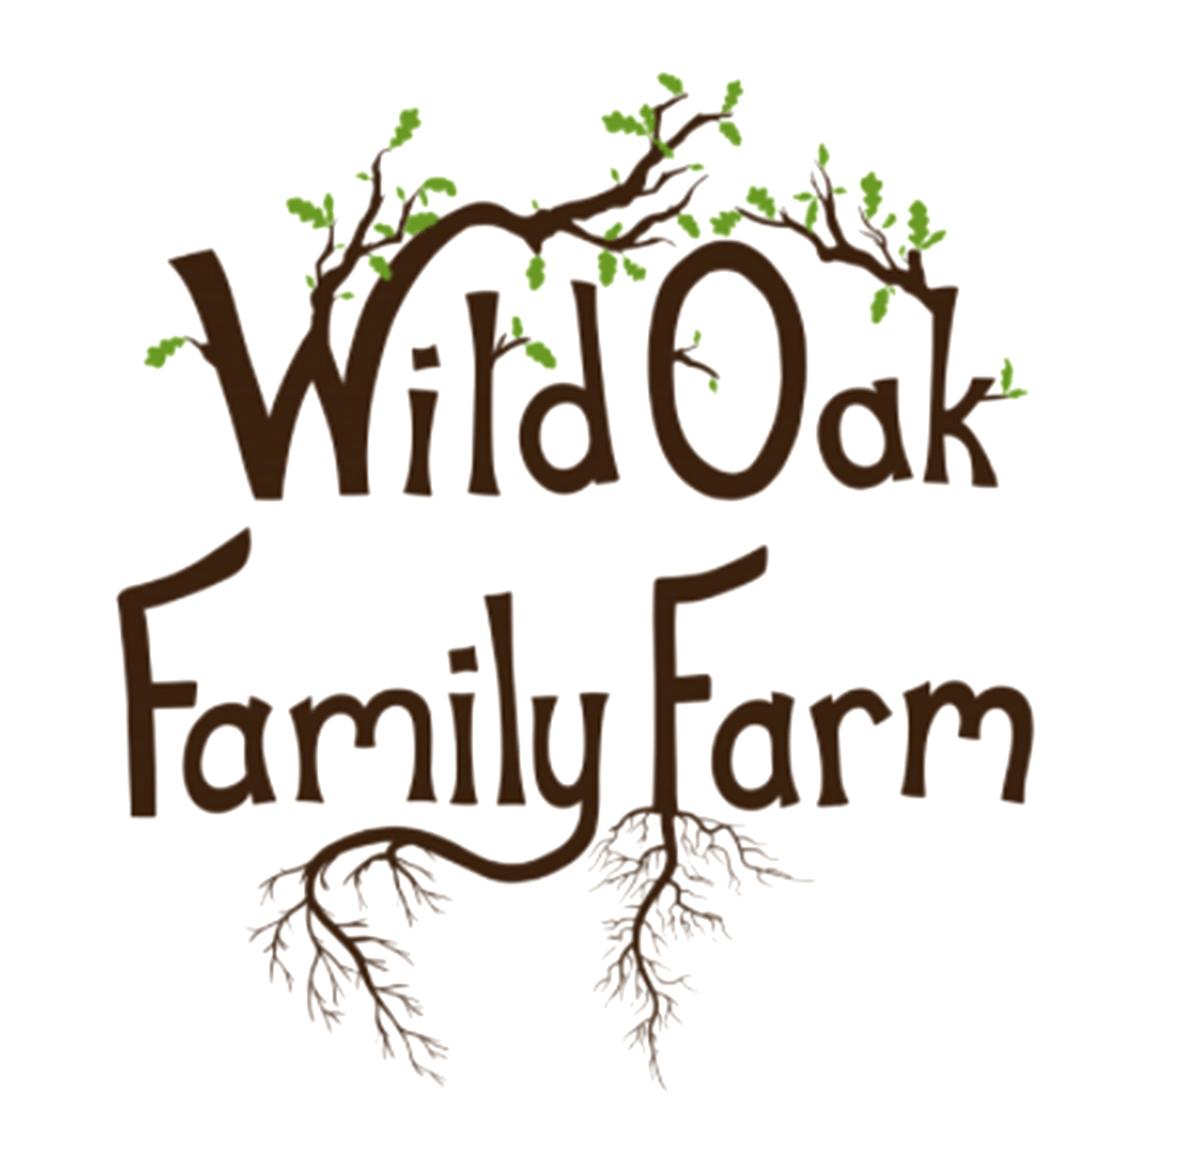 Wild Oak Family Farm